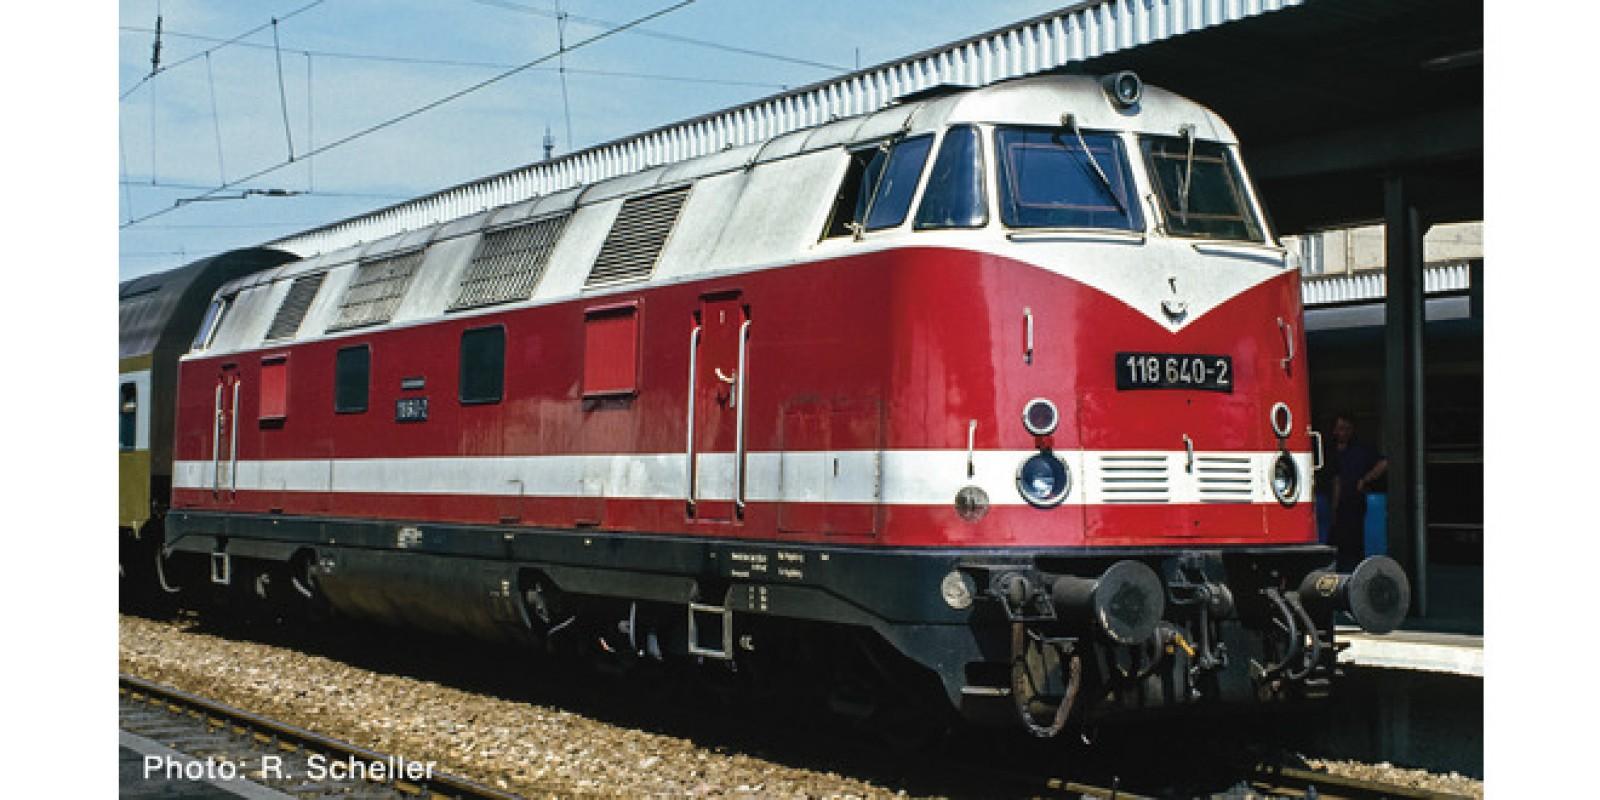 RO73893 - Diesel locomotive class 118, DR